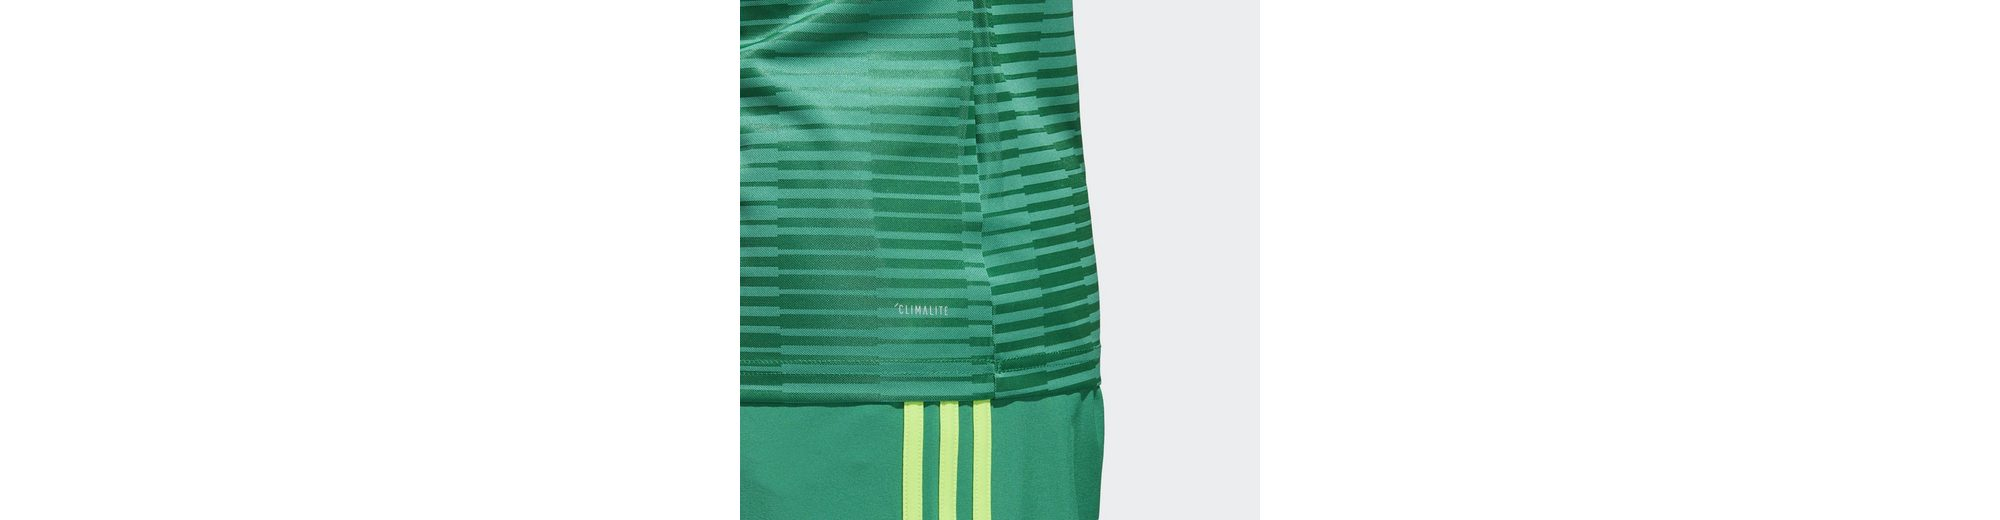 18 Footballtrikot Adidas Trikot Condivo Performance pF6WwyxAqP